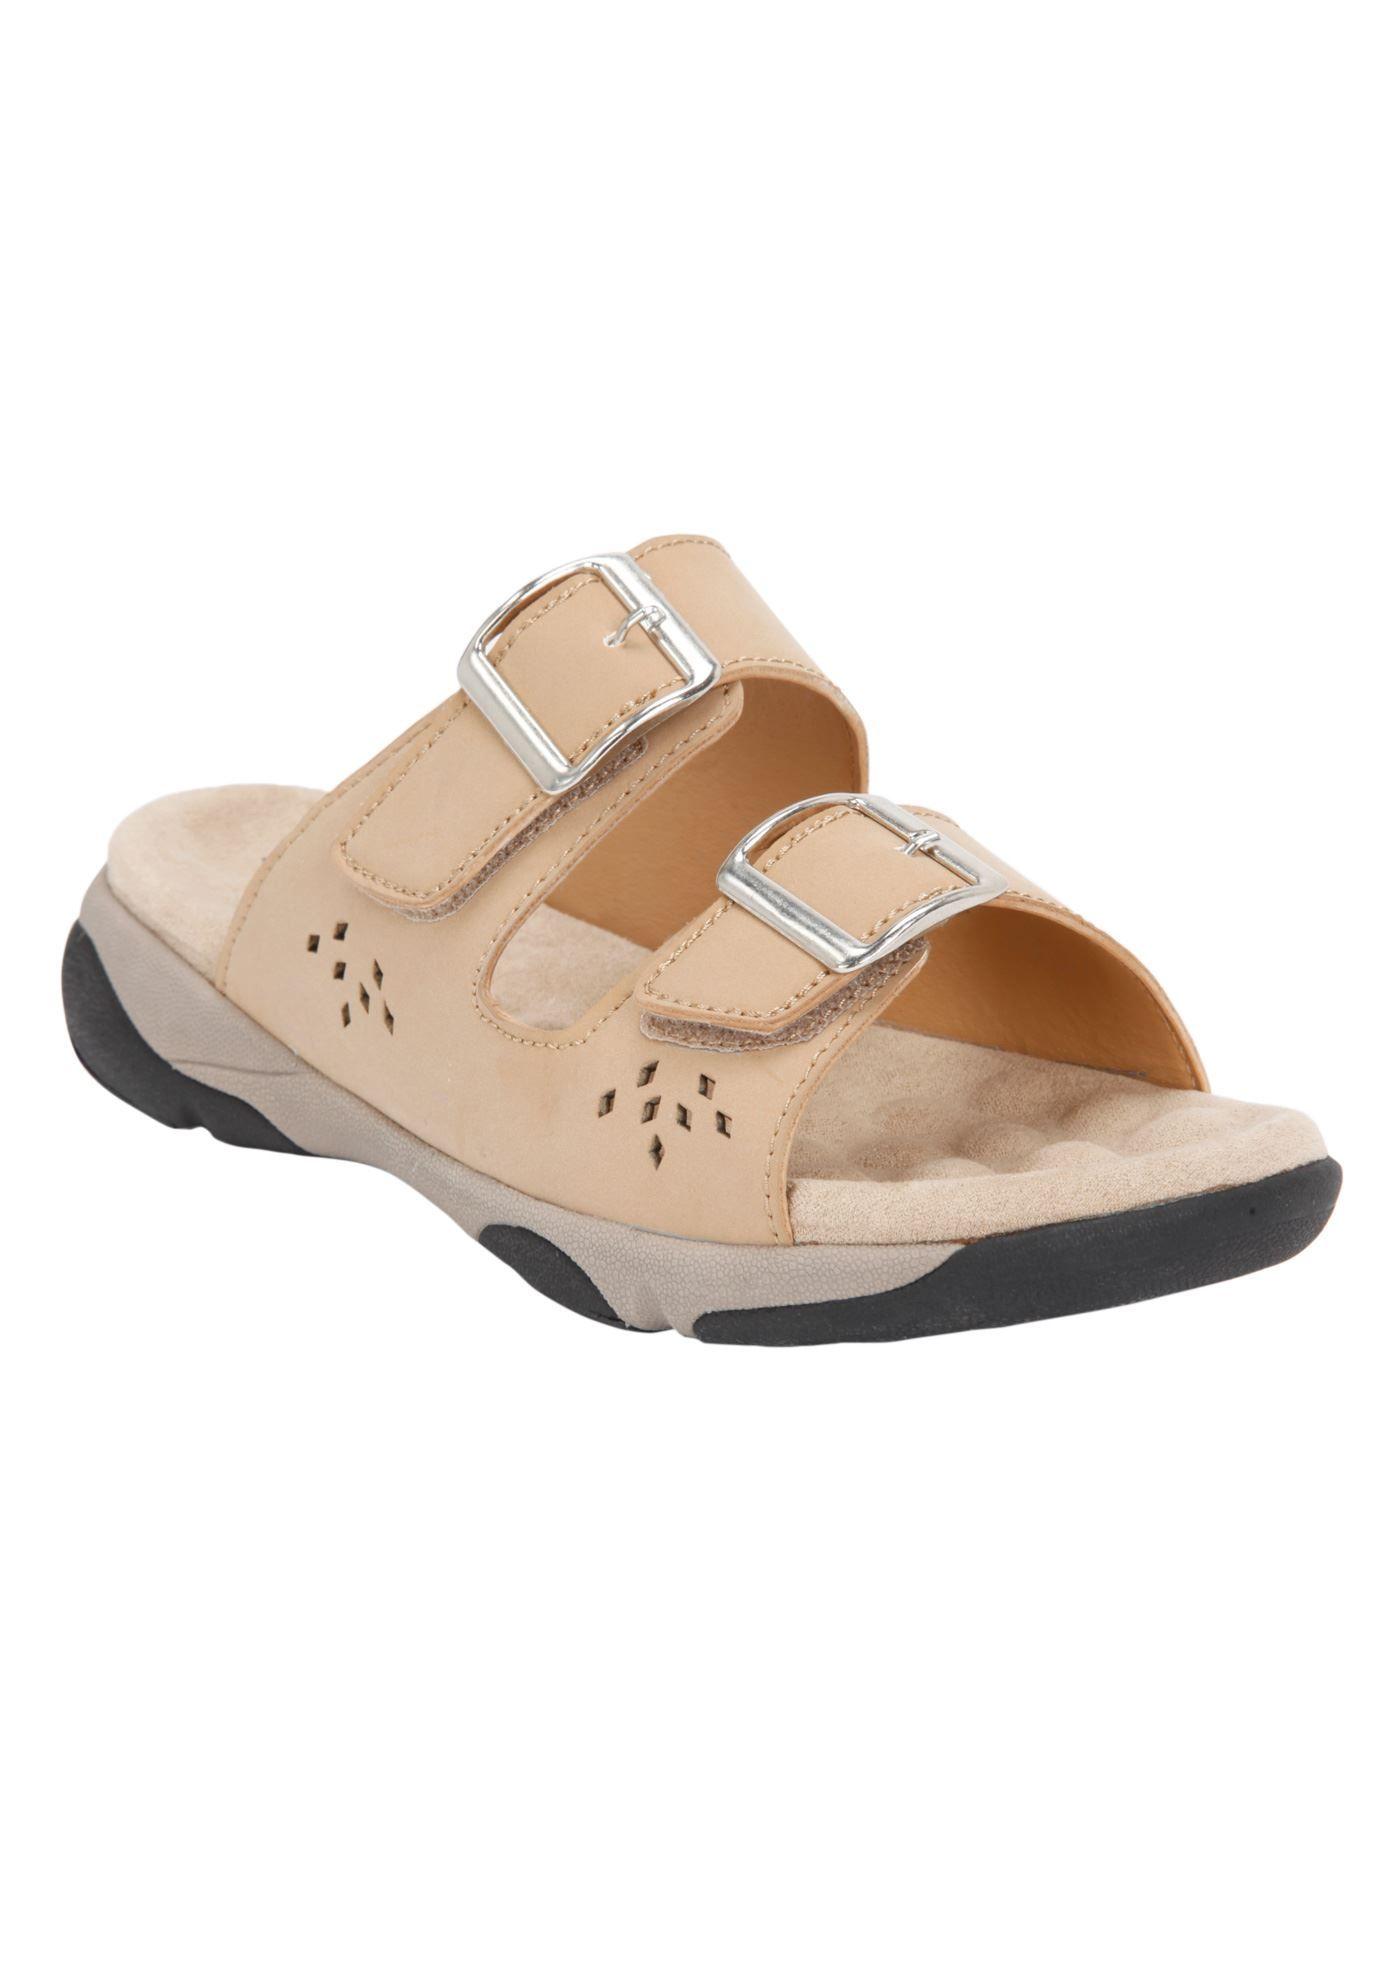 463138 Samira Trek Sandal by Comfortview Wide width